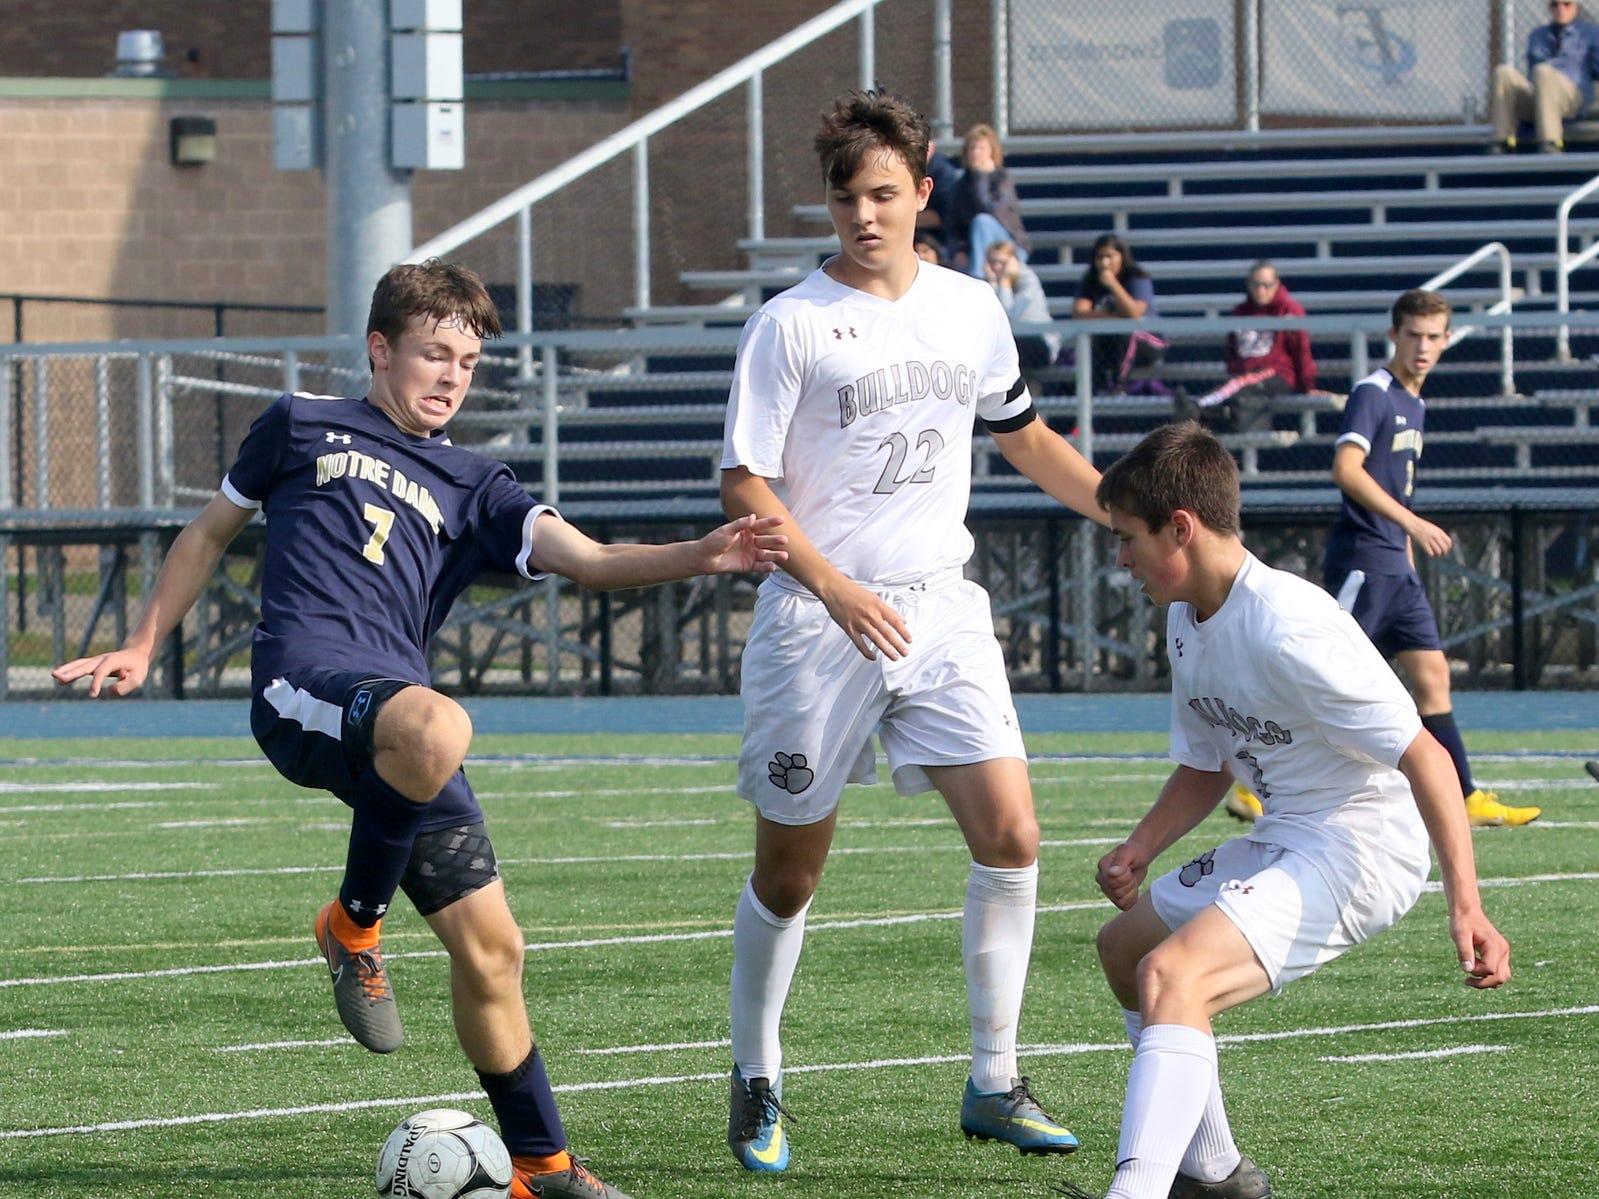 Elmira Notre Dame was a 3-2 winner over Delhi in boys soccer Oct. 8, 2018 at Brewer Memorial Stadium at Notre Dame High School.